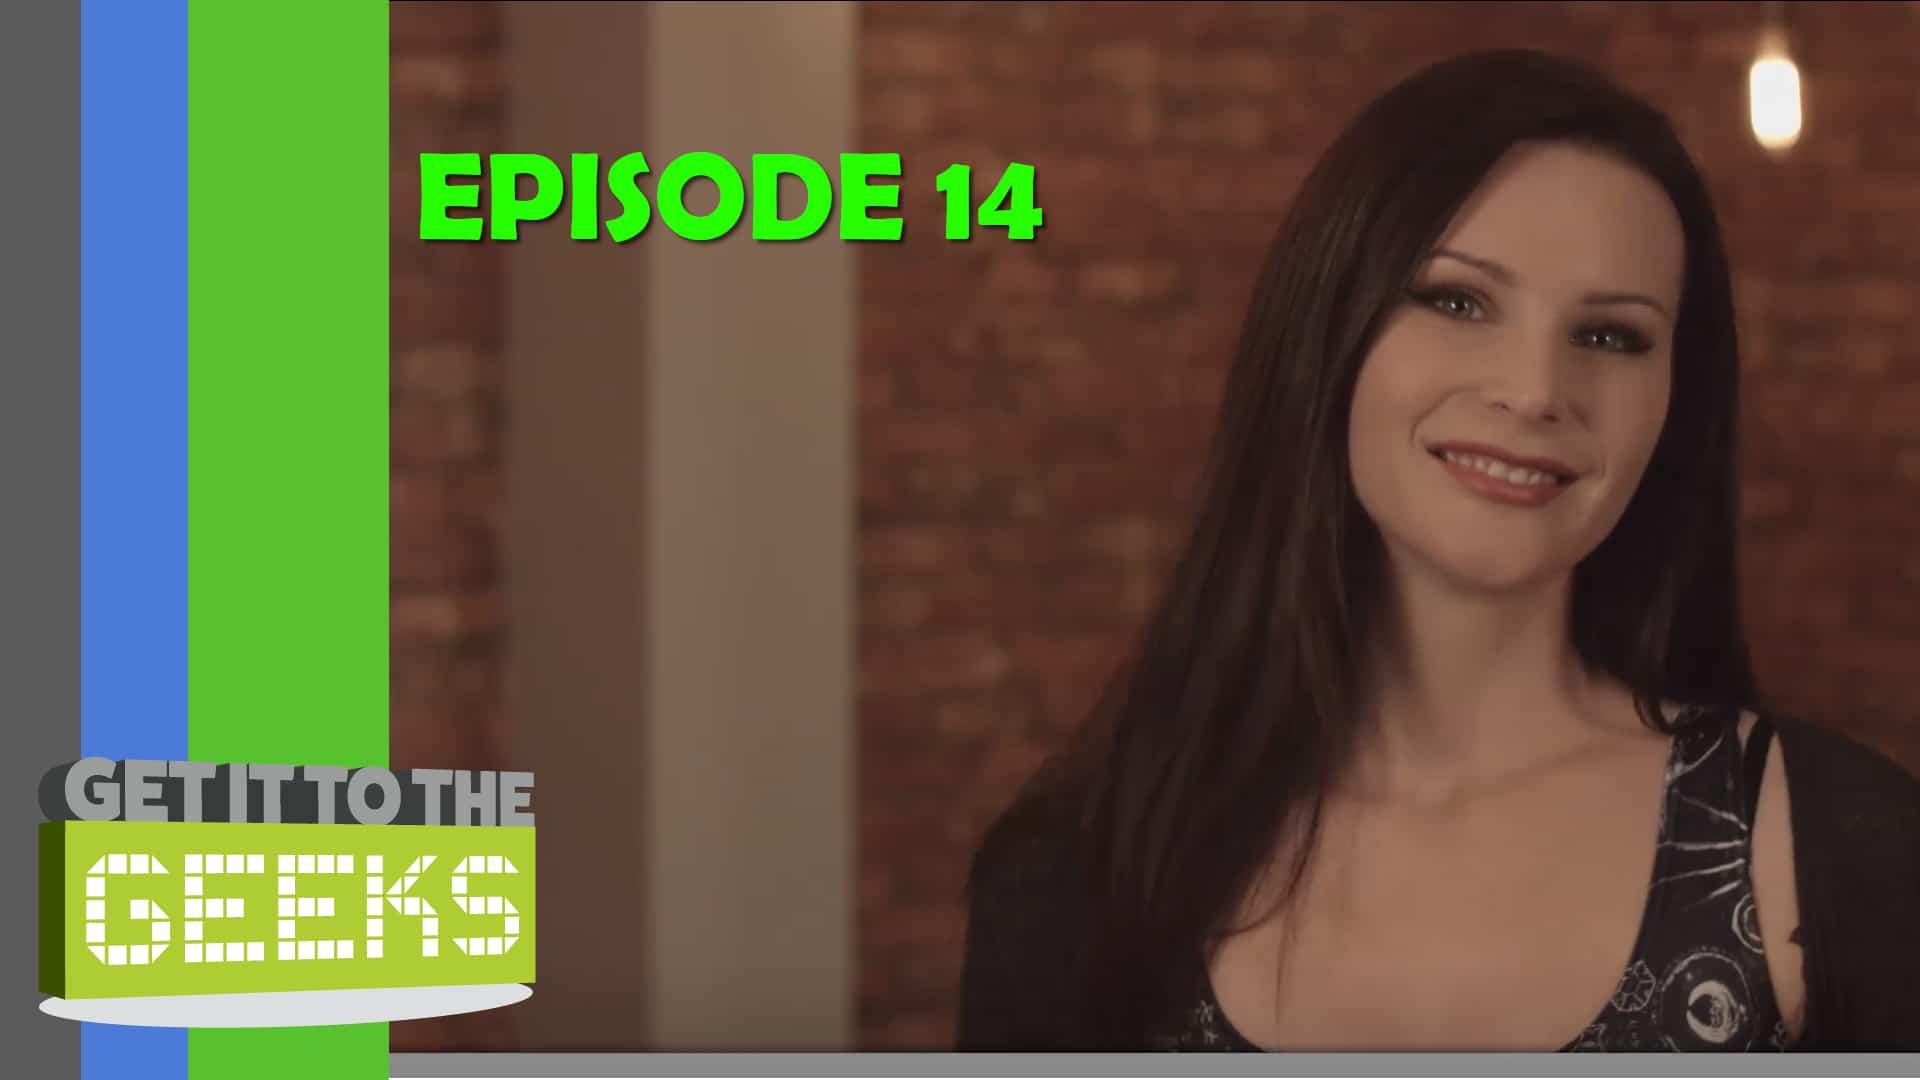 Get It To The Geeks - Episode 14: Twice The Force Half Awaken